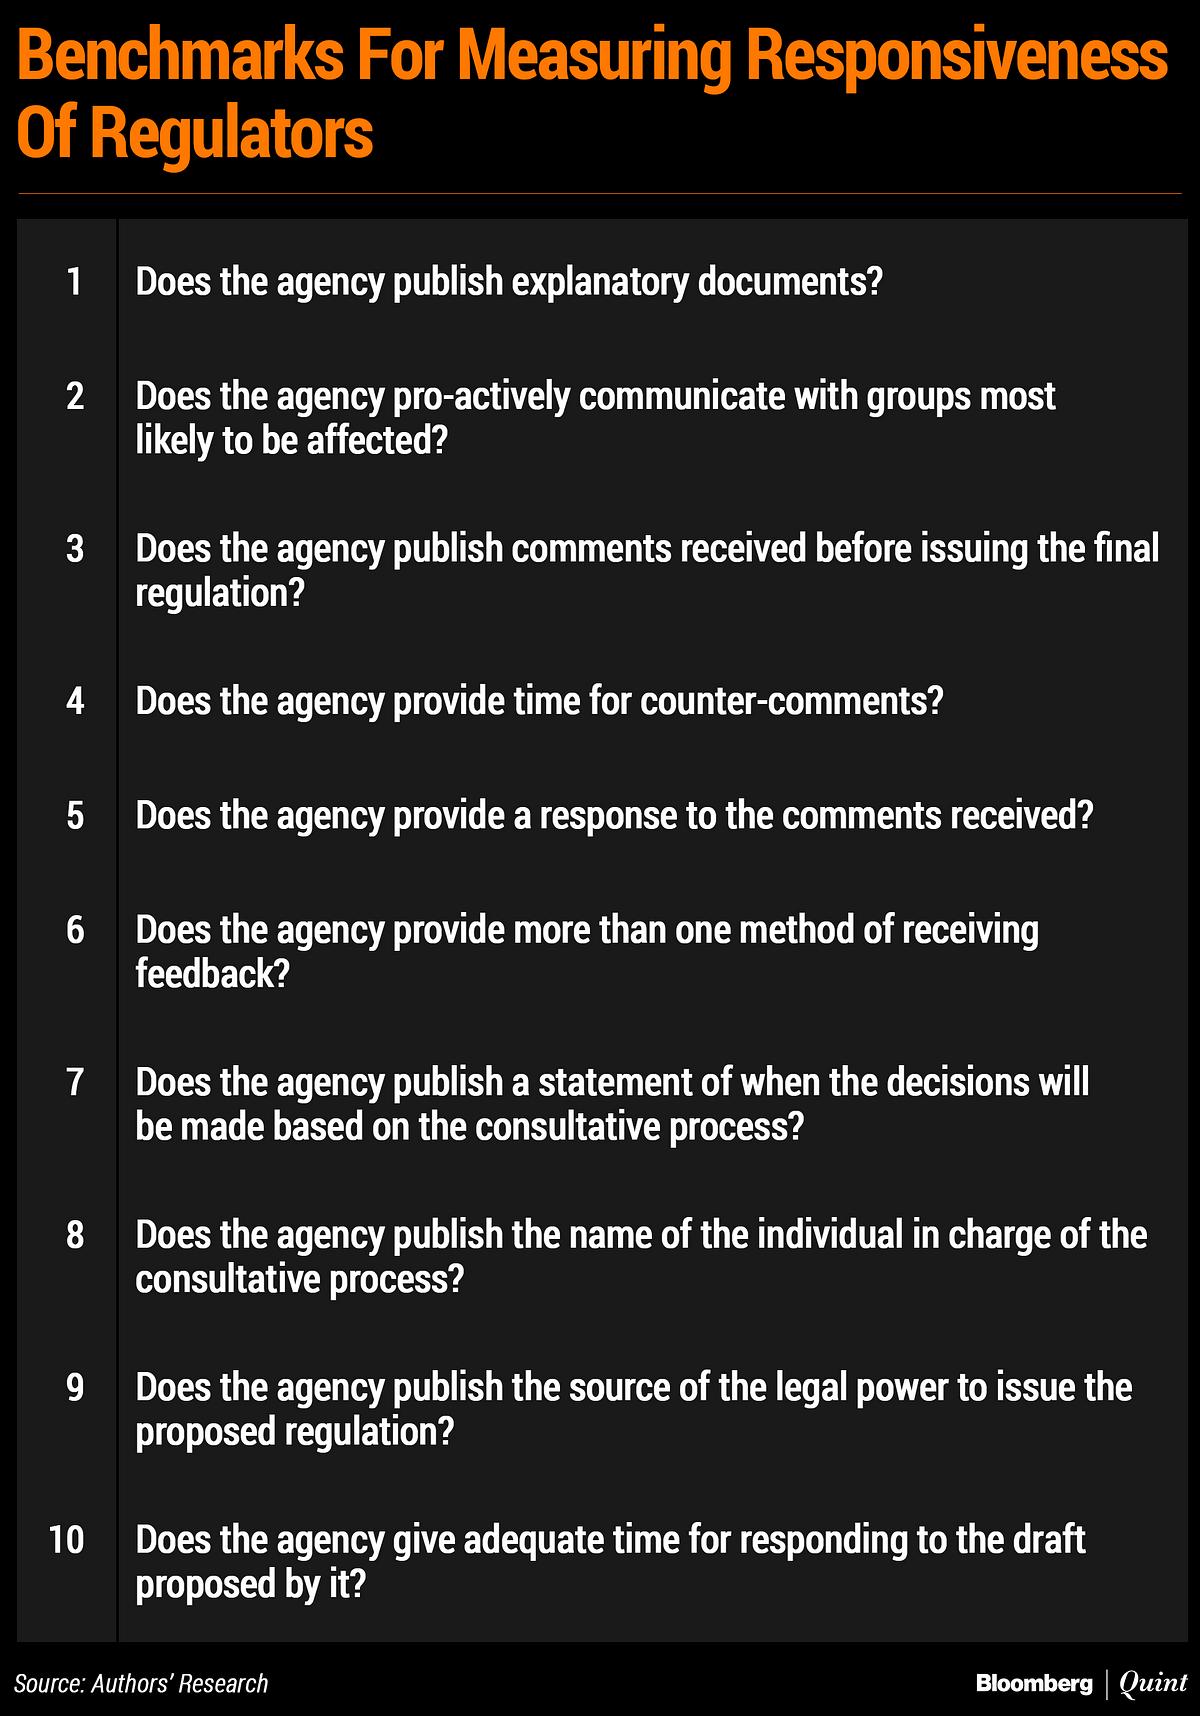 How Responsive Are India's Regulators?